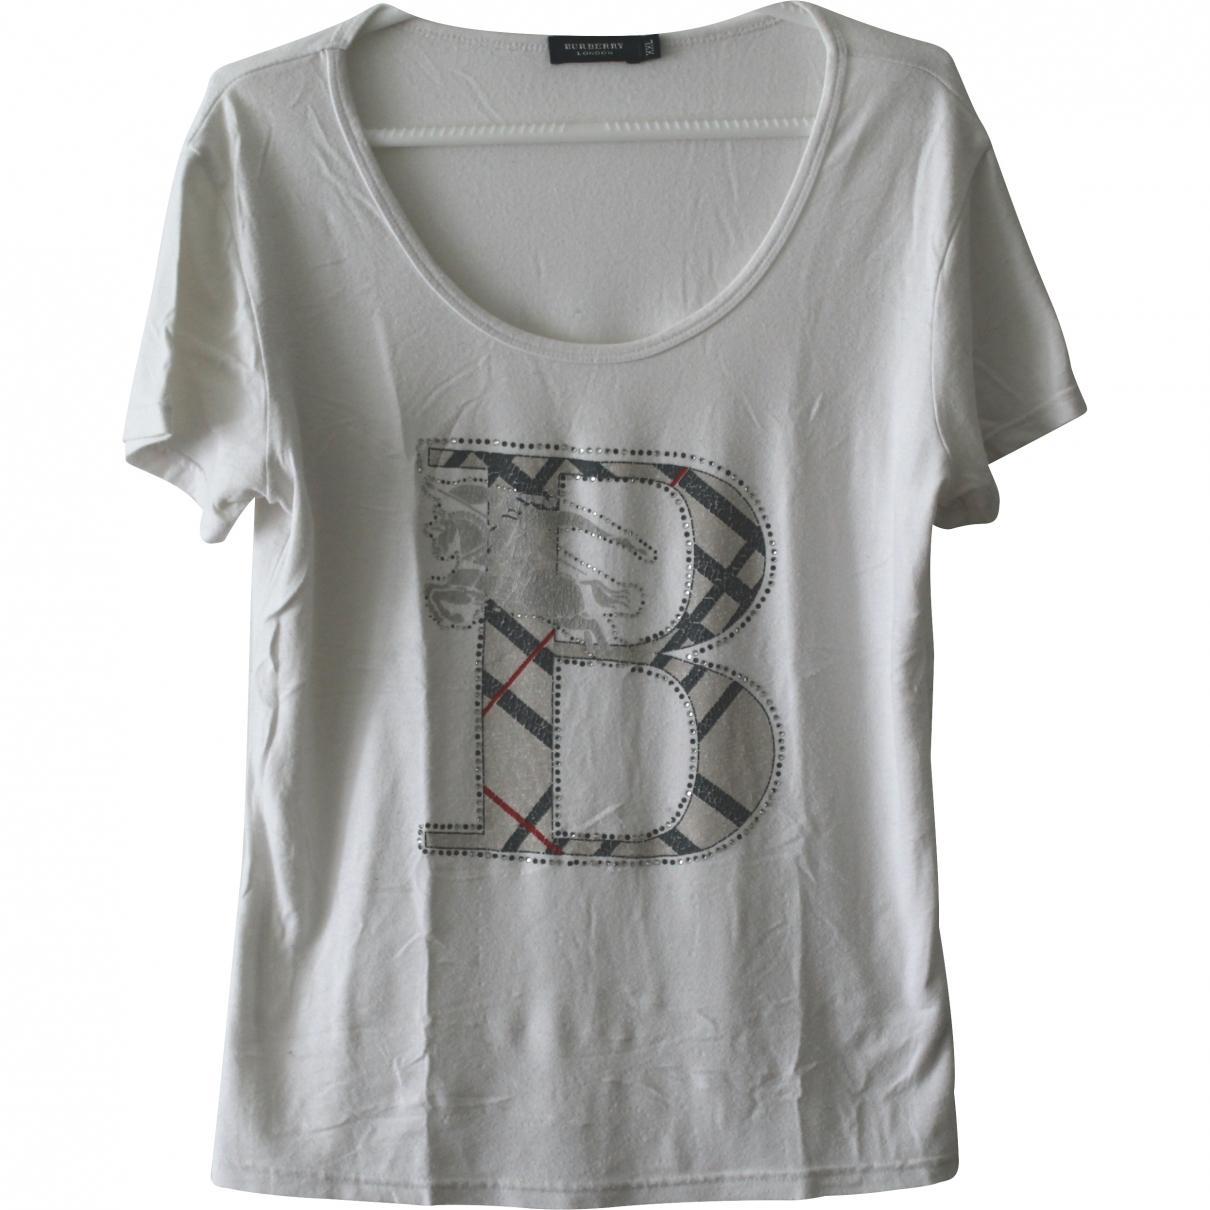 Burberry \N Ecru Cotton  top for Women 36 FR